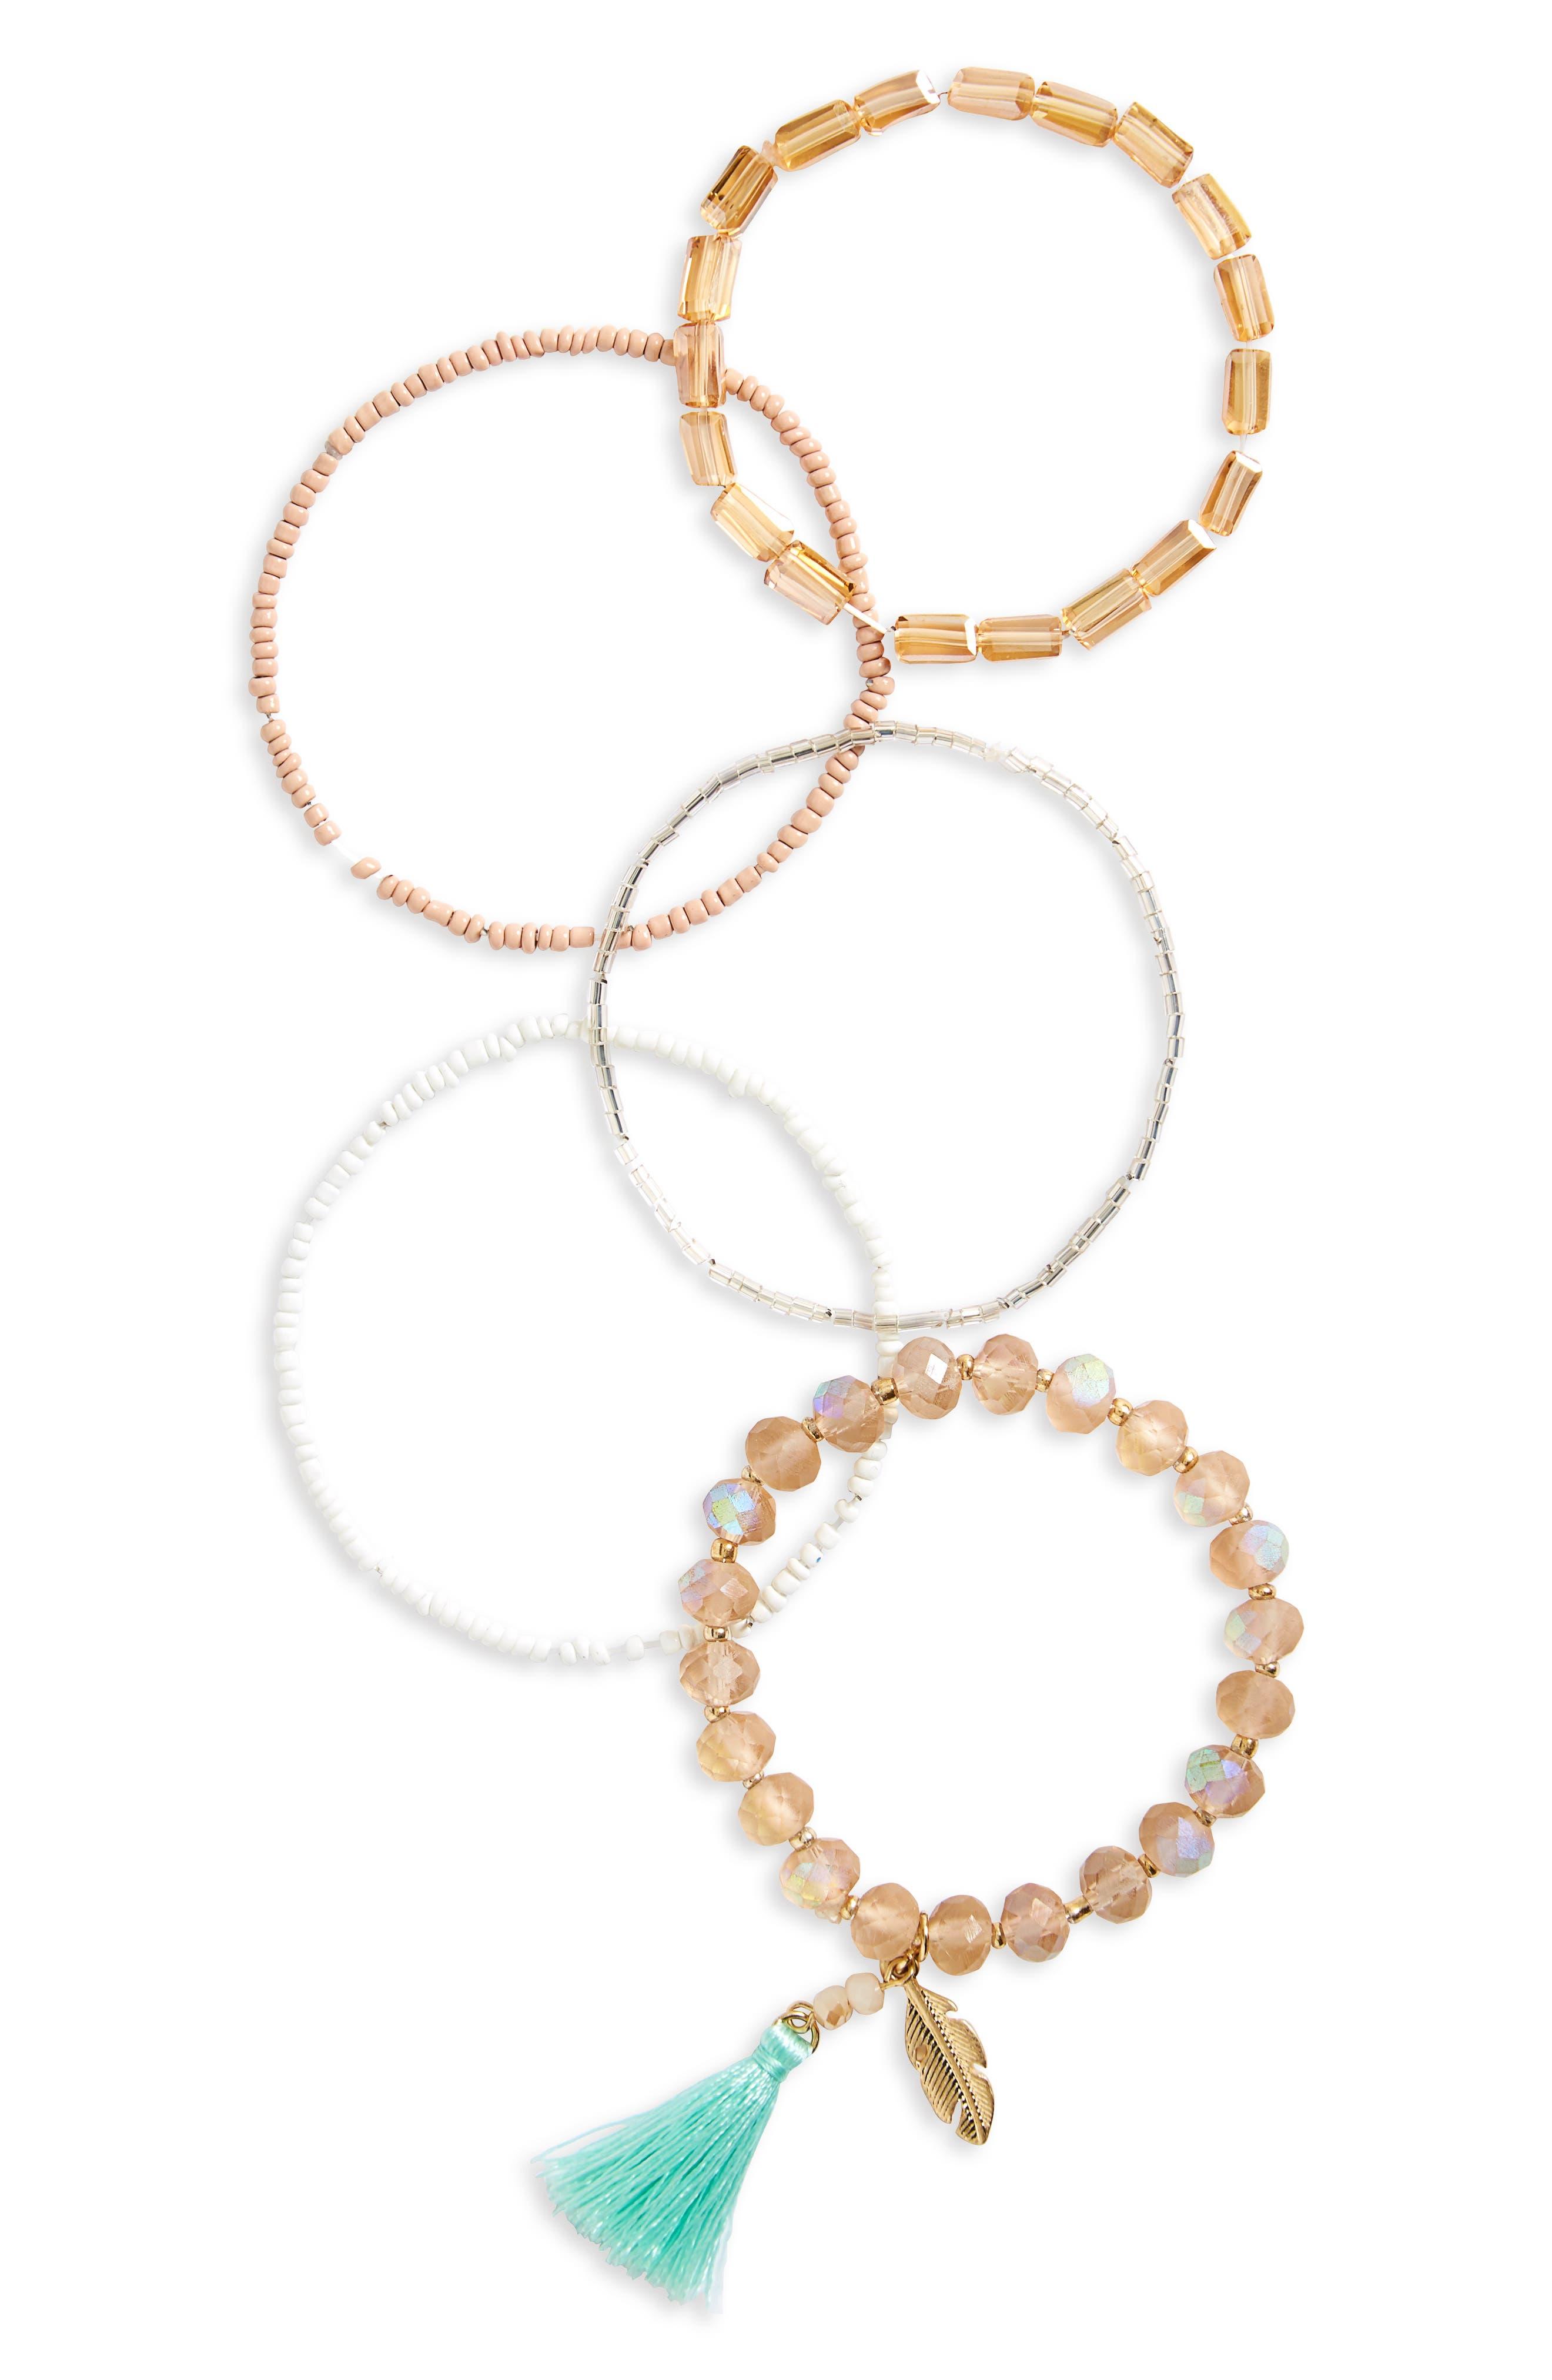 Set of 5 Assorted Stretch Bracelets,                             Main thumbnail 1, color,                             710